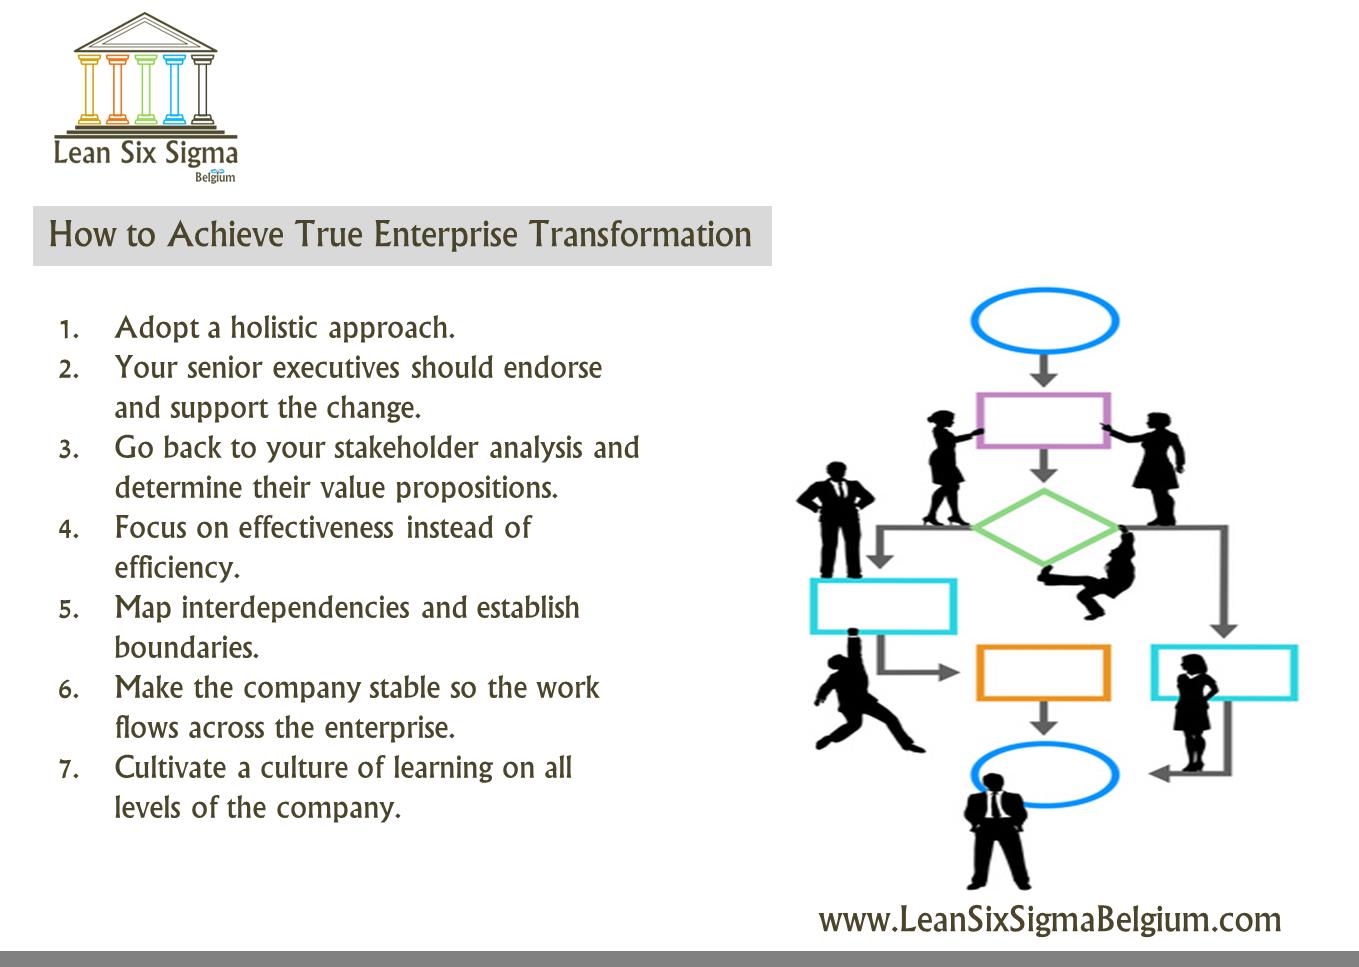 How to achieve true enterprise transformation lean six sigma belgium lean management training lean six sigma belgium ccuart Image collections